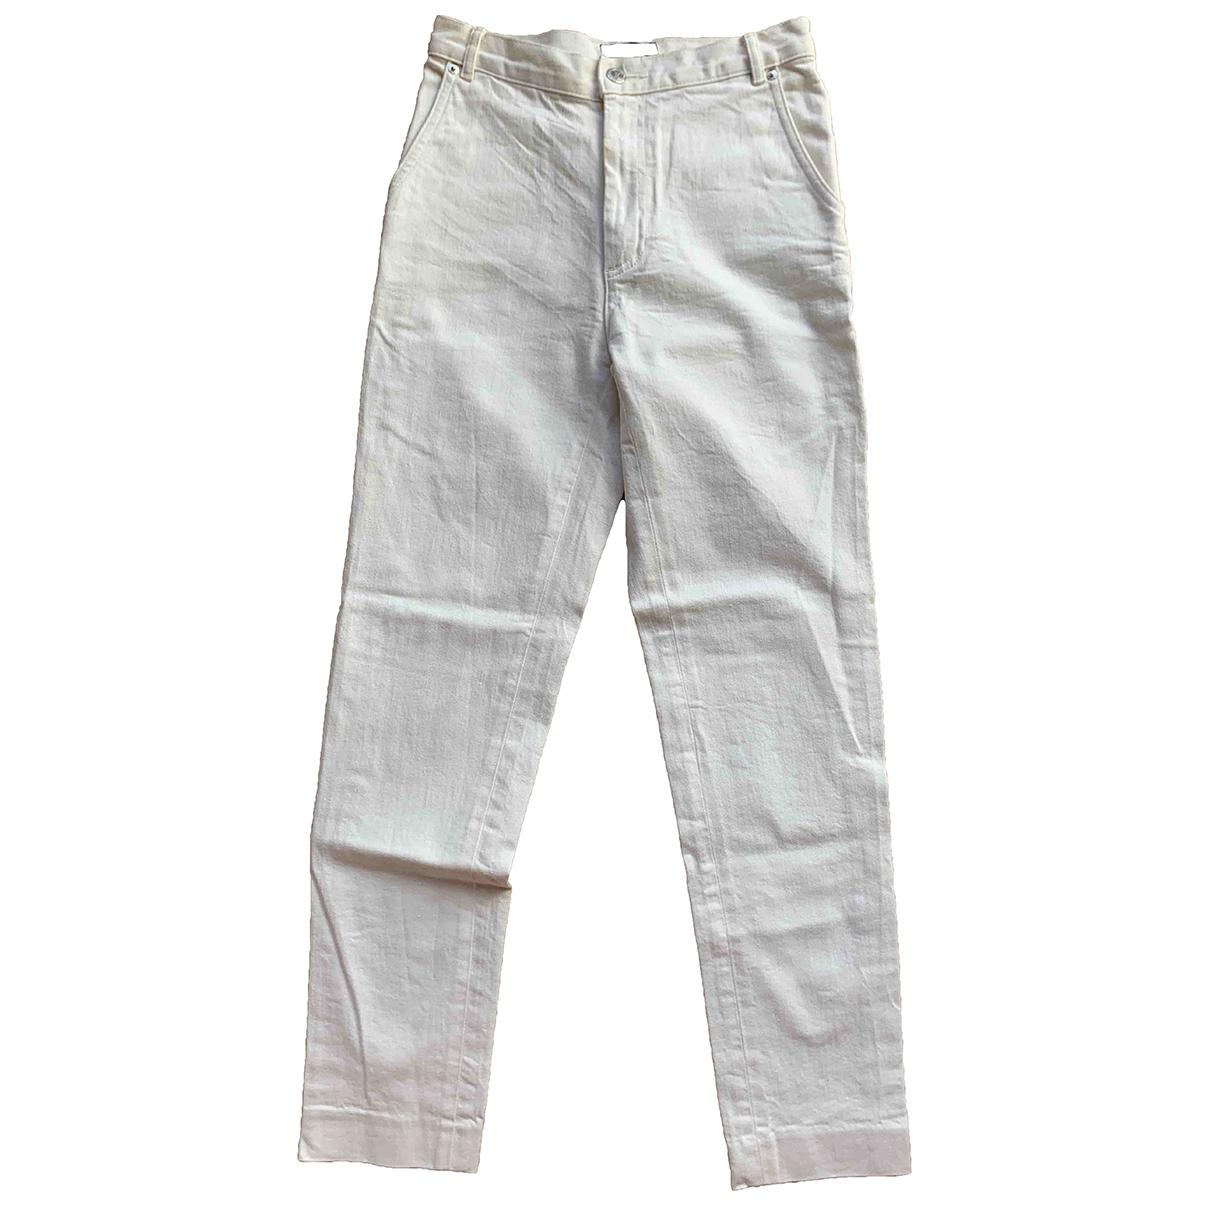 Apc Vanessa seward White Cotton Jeans for Women 36 FR